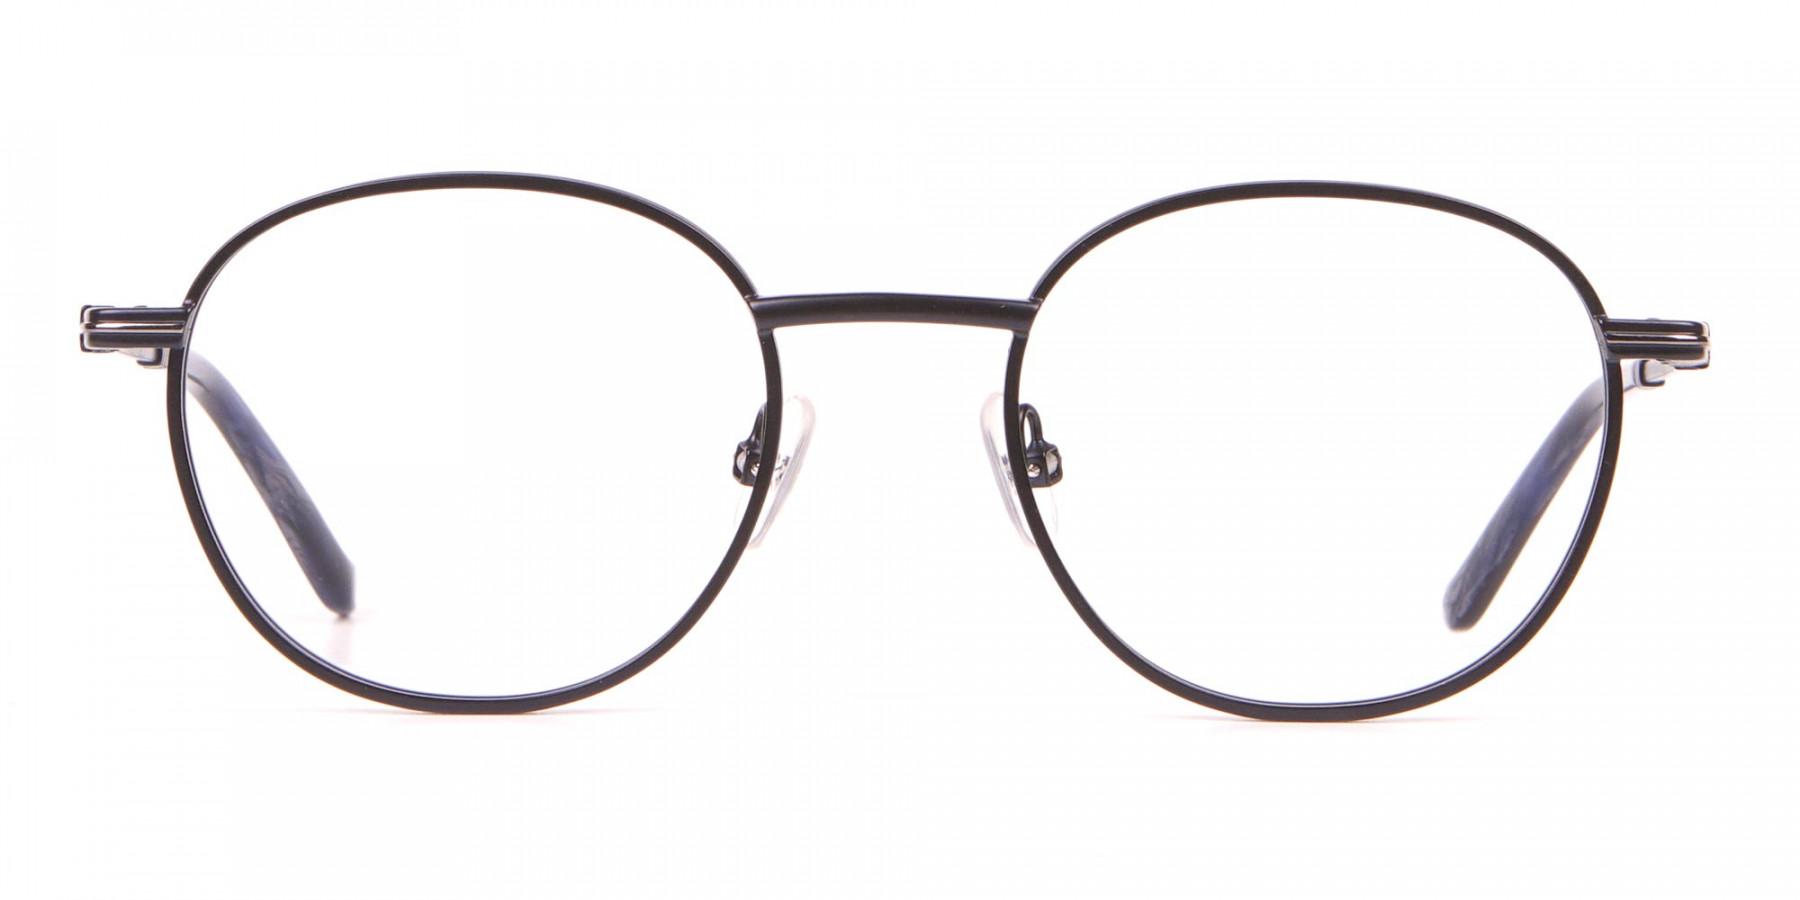 HACKETT HEB222 Bespoke Metal Classic Round Glasses Blue-1